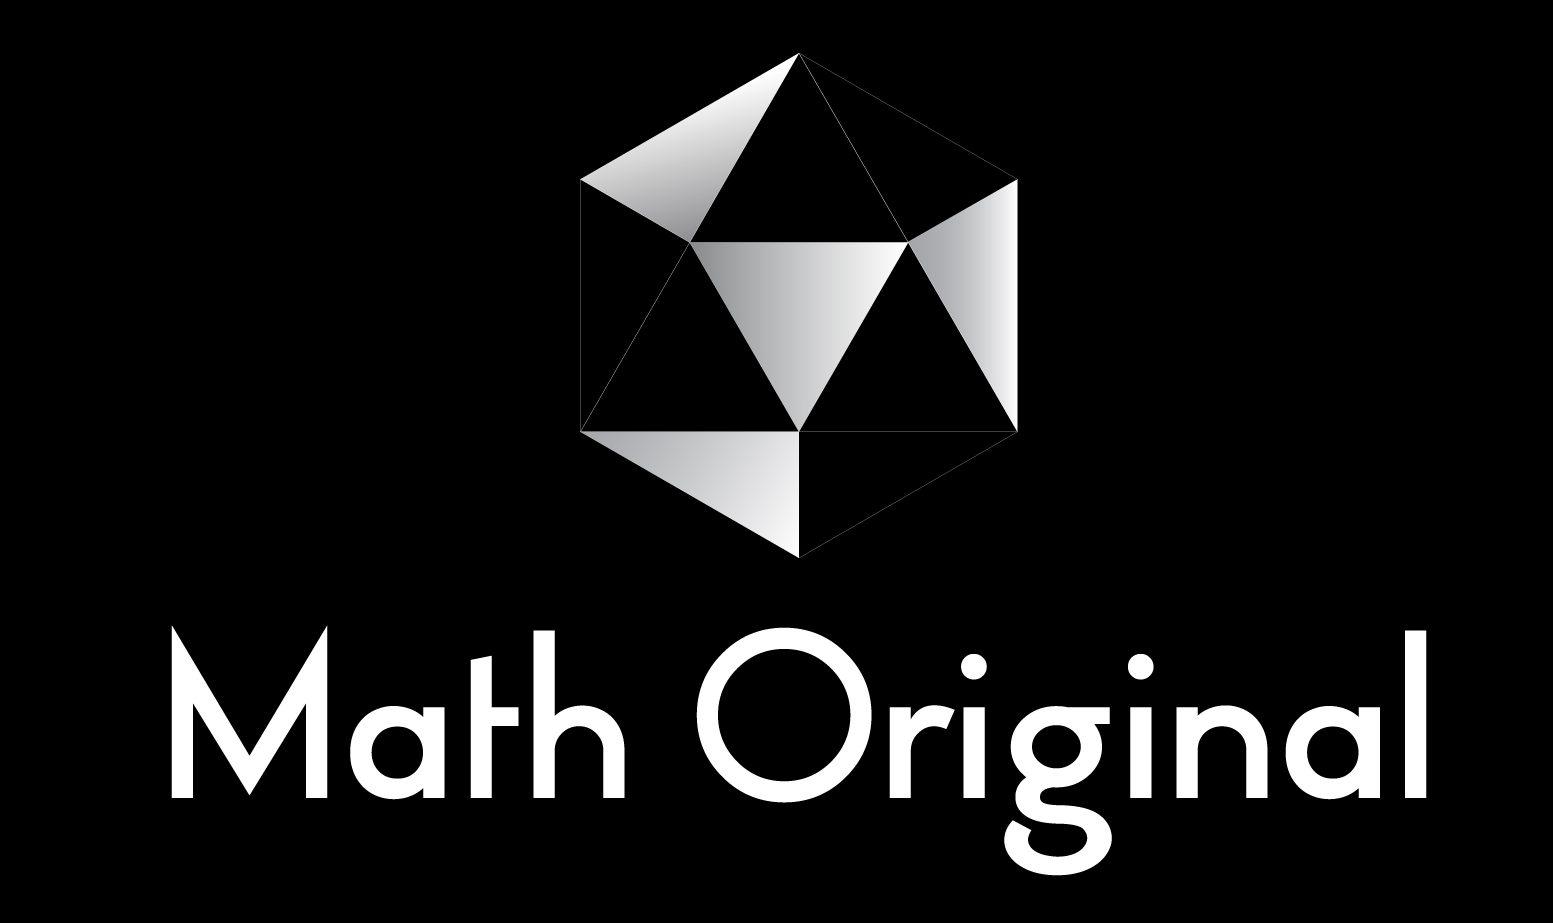 Math Original